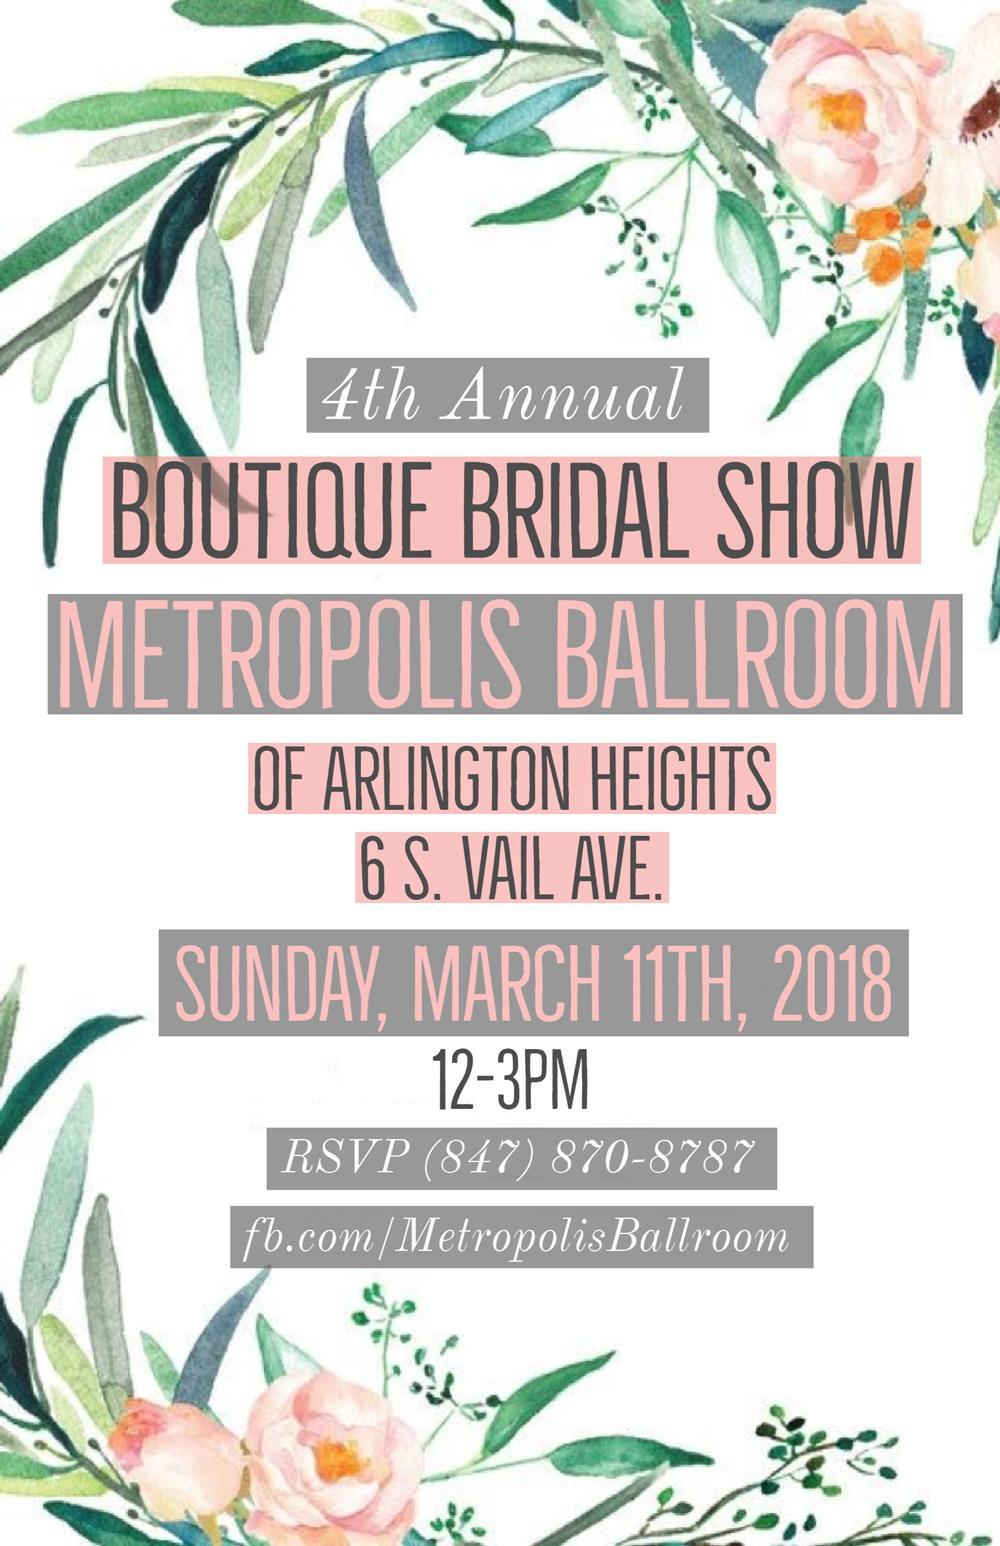 Boutique Bridal Show at Metropolis Ballroom in Arlington Heights, Illinois